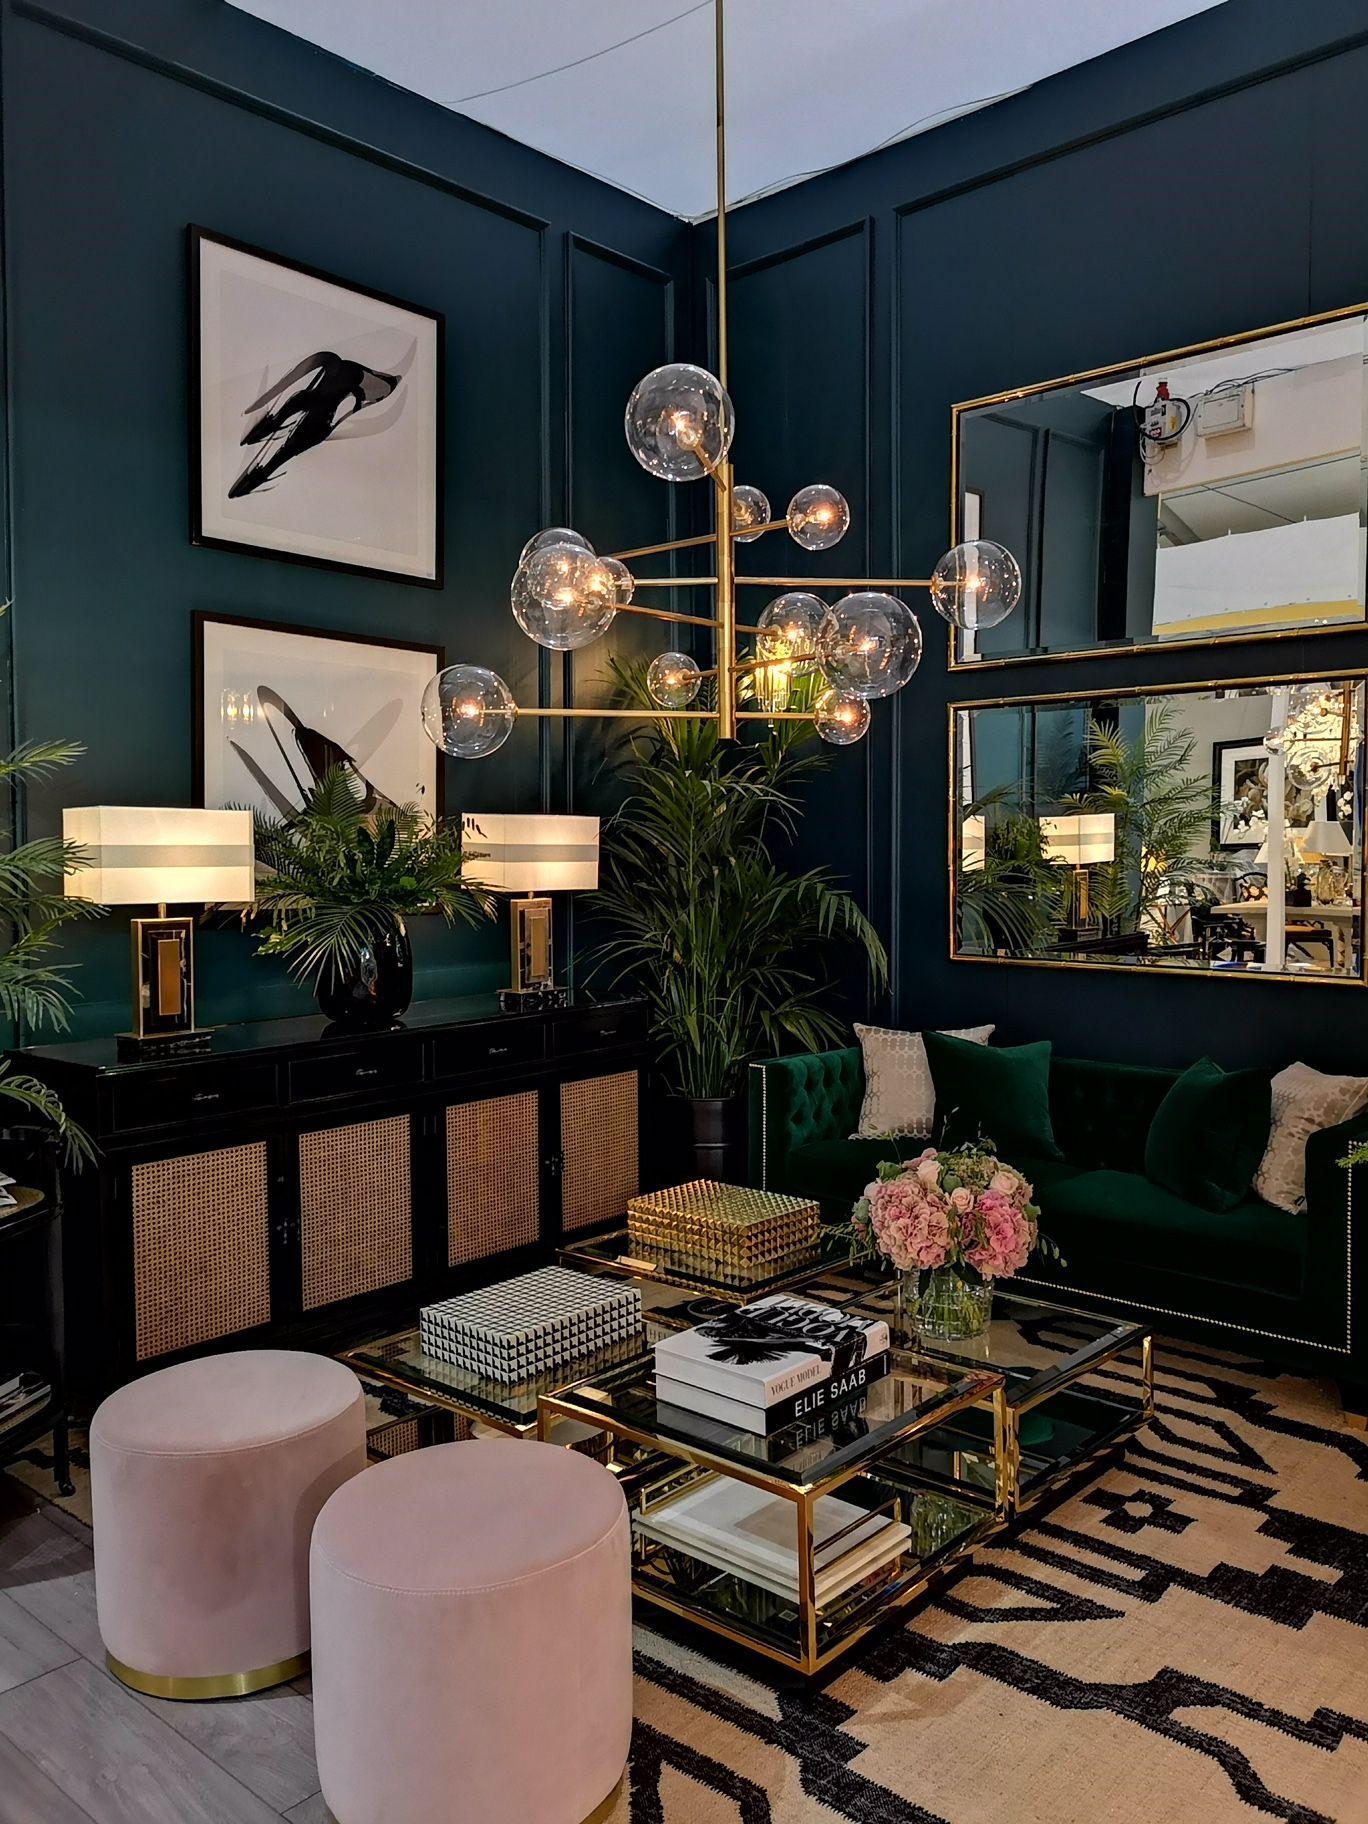 Best Uk Interior Designers Projects Www Delightfull Eu Visit Us For Interior Design Ideas Interi Living Room Decor Modern Luxury Home Decor Room Interior